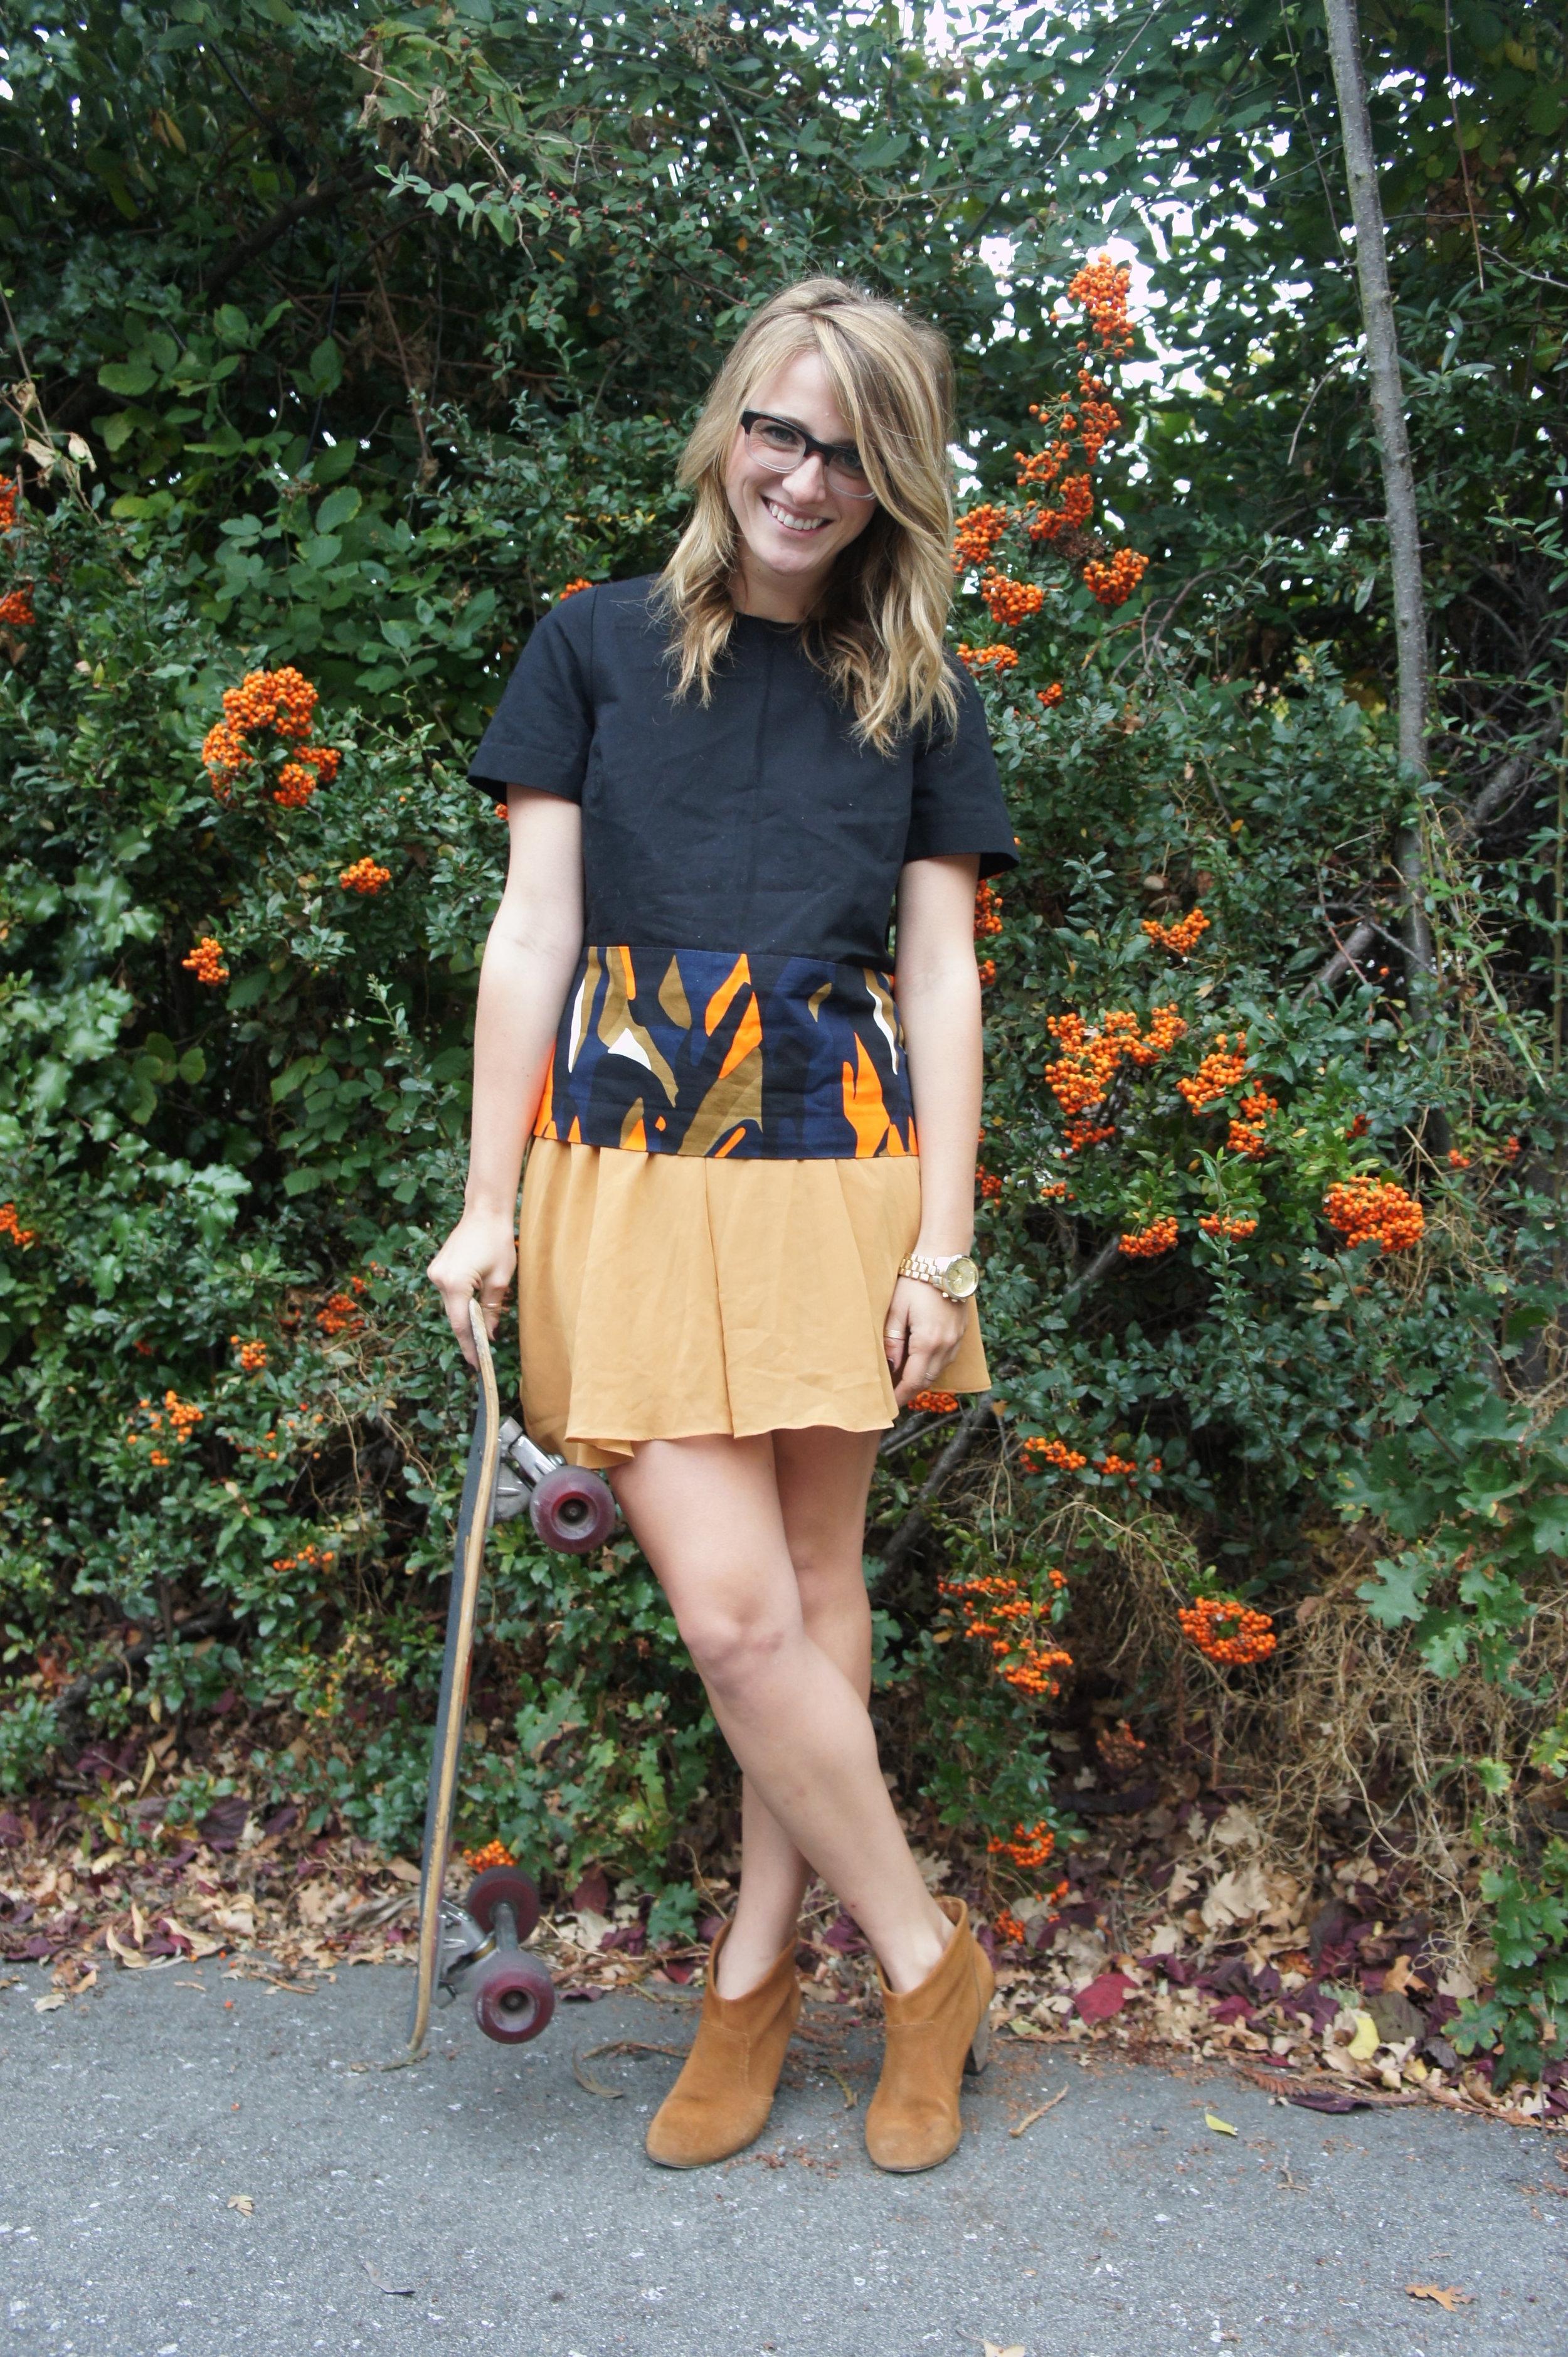 Shirt: Asos via Crossroads Trading | Skirt: F21 | Boots: Carlos by Carlos Santana